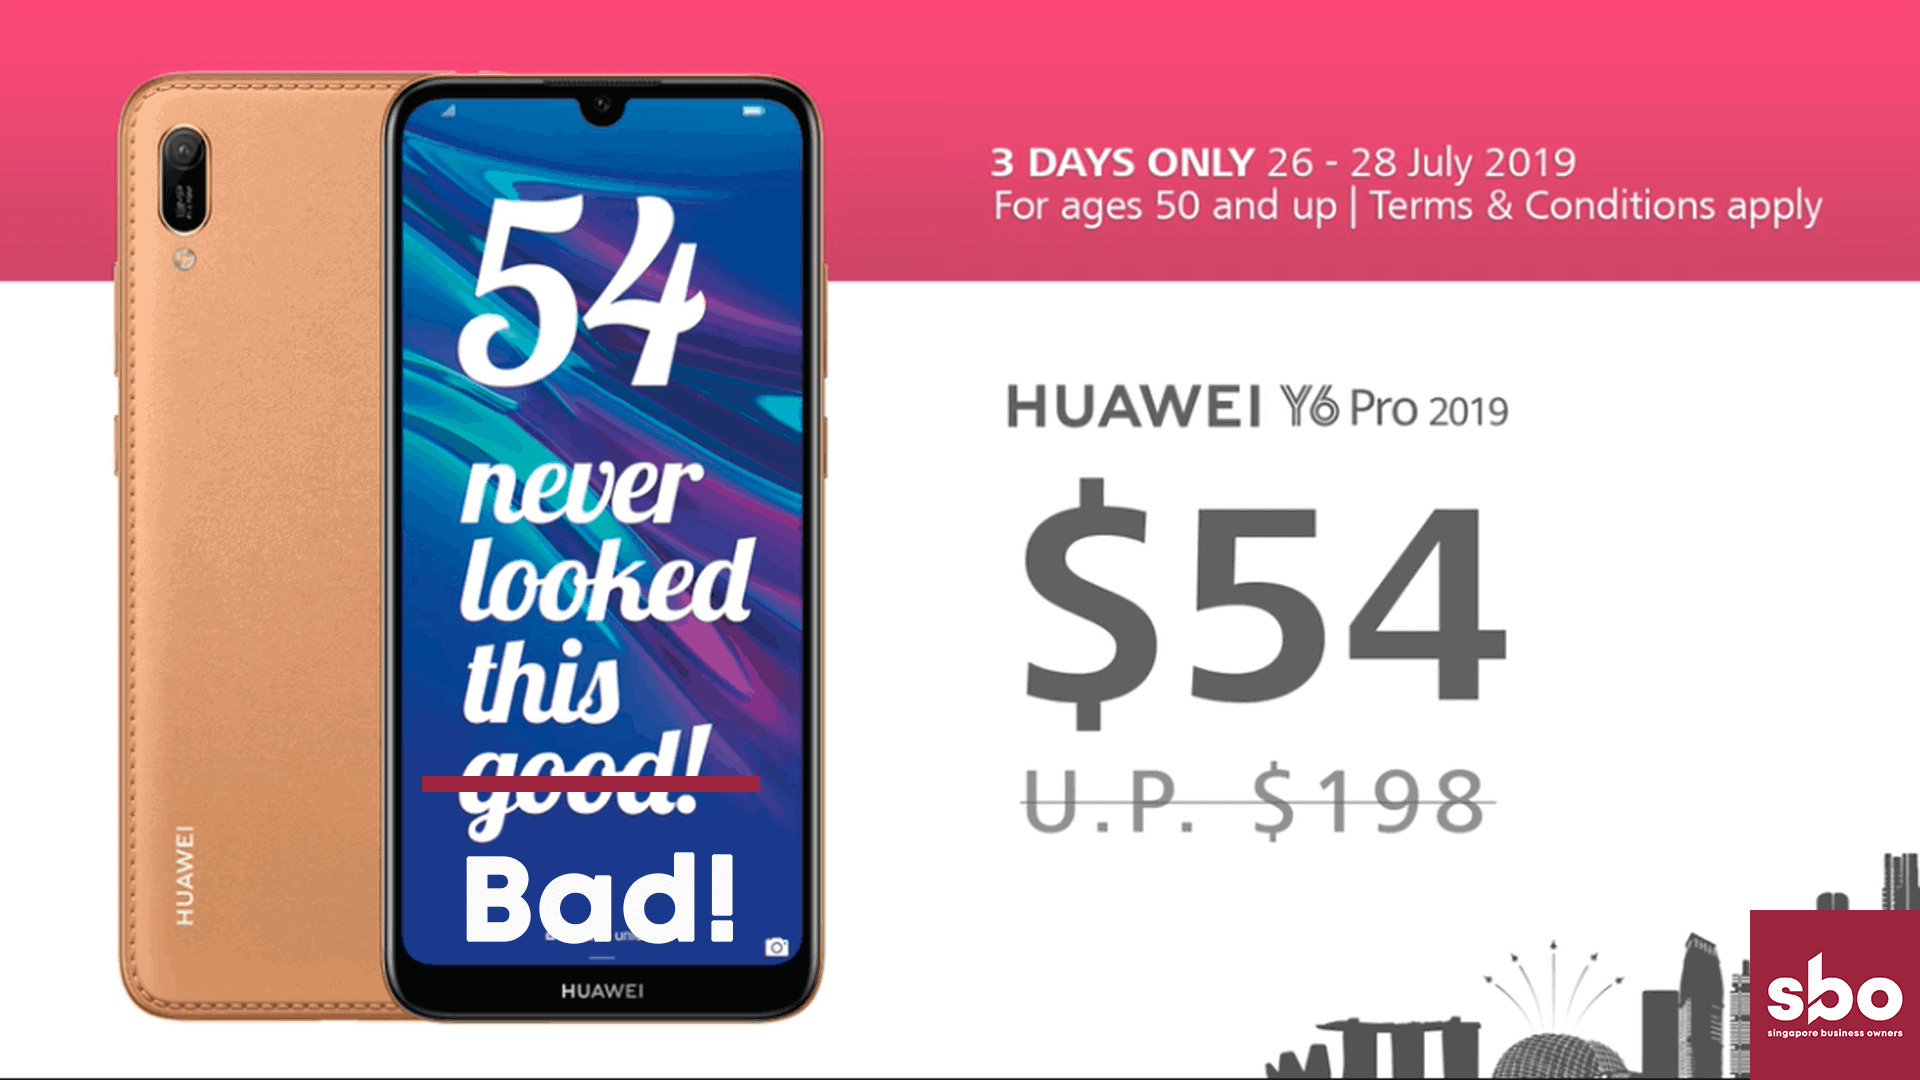 Huawei $54 Promotion